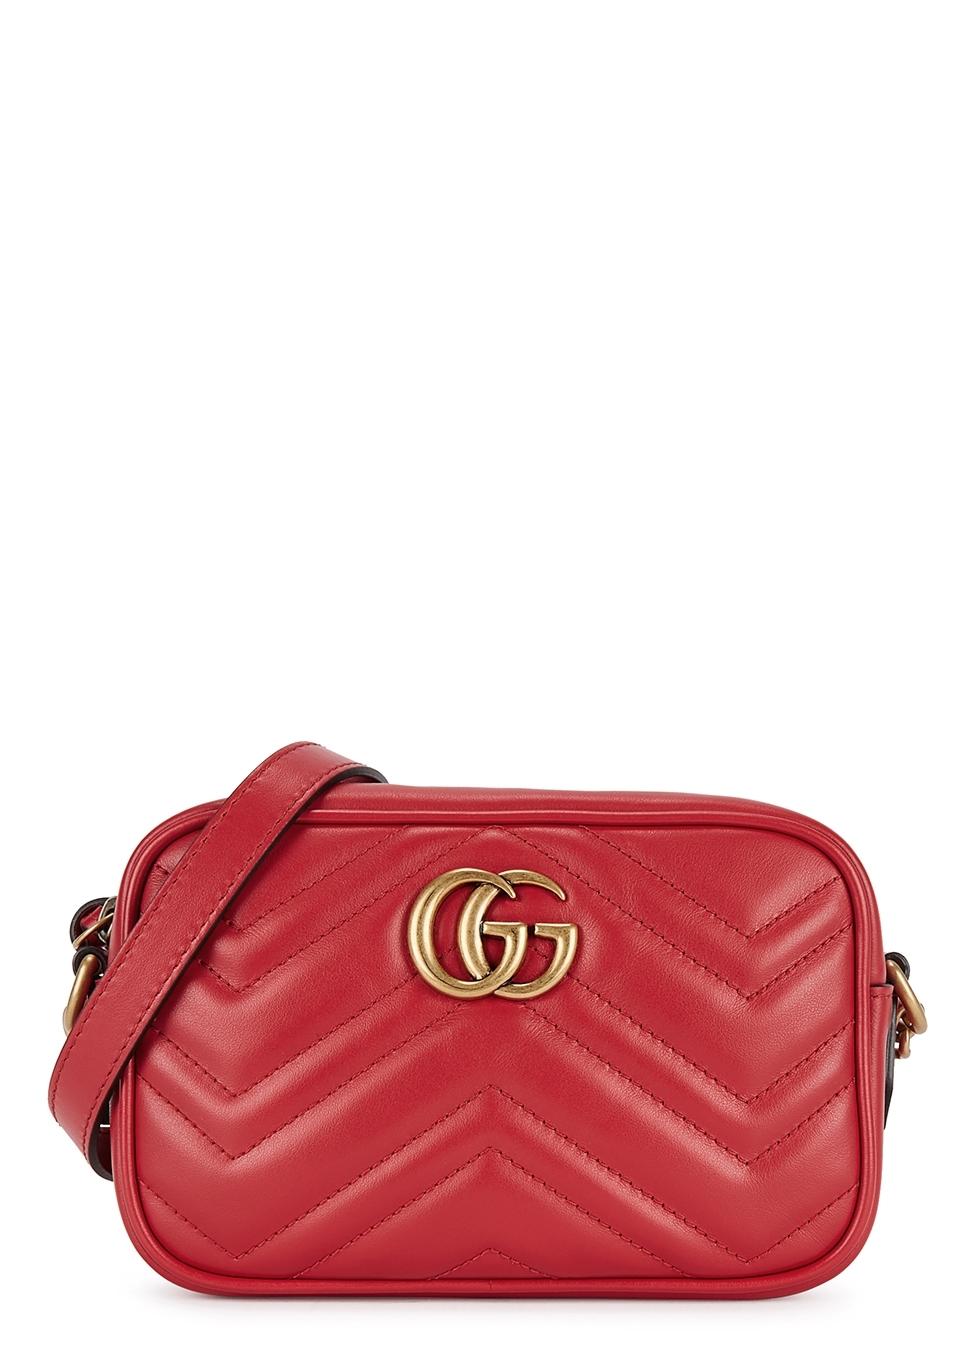 beff34bdf09f Women s Designer Bags